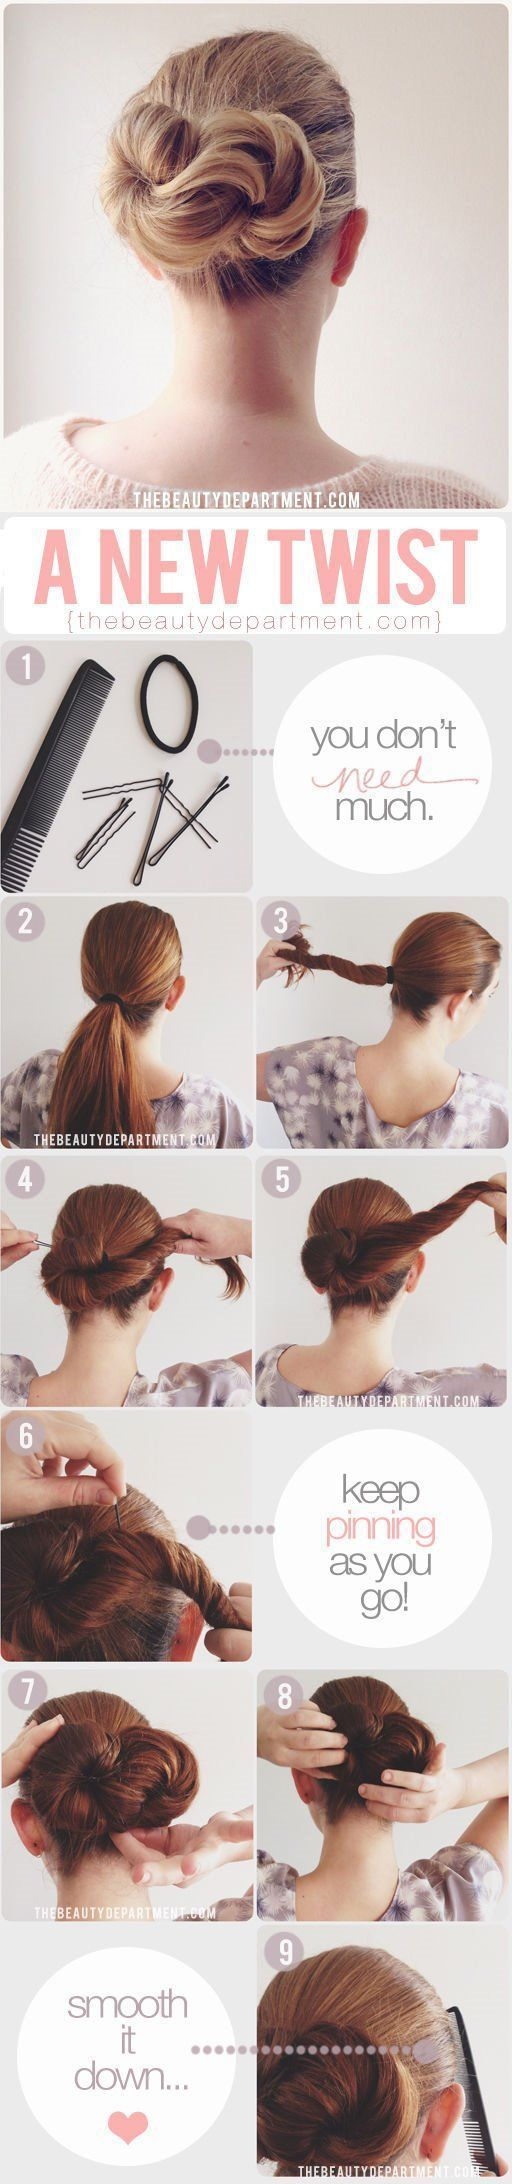 Long hair style: twist updo.